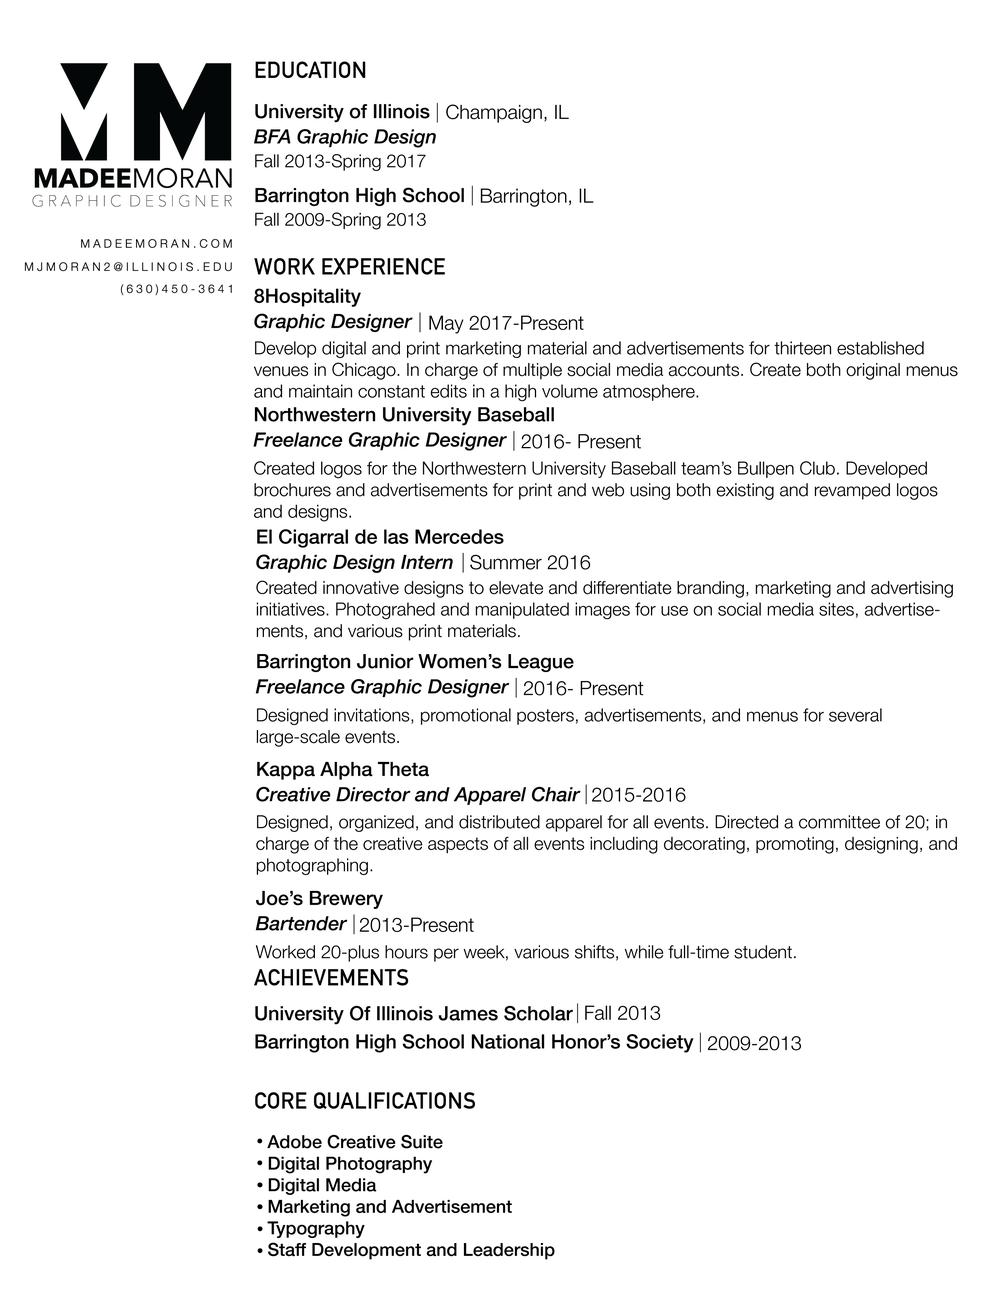 resume madee moran